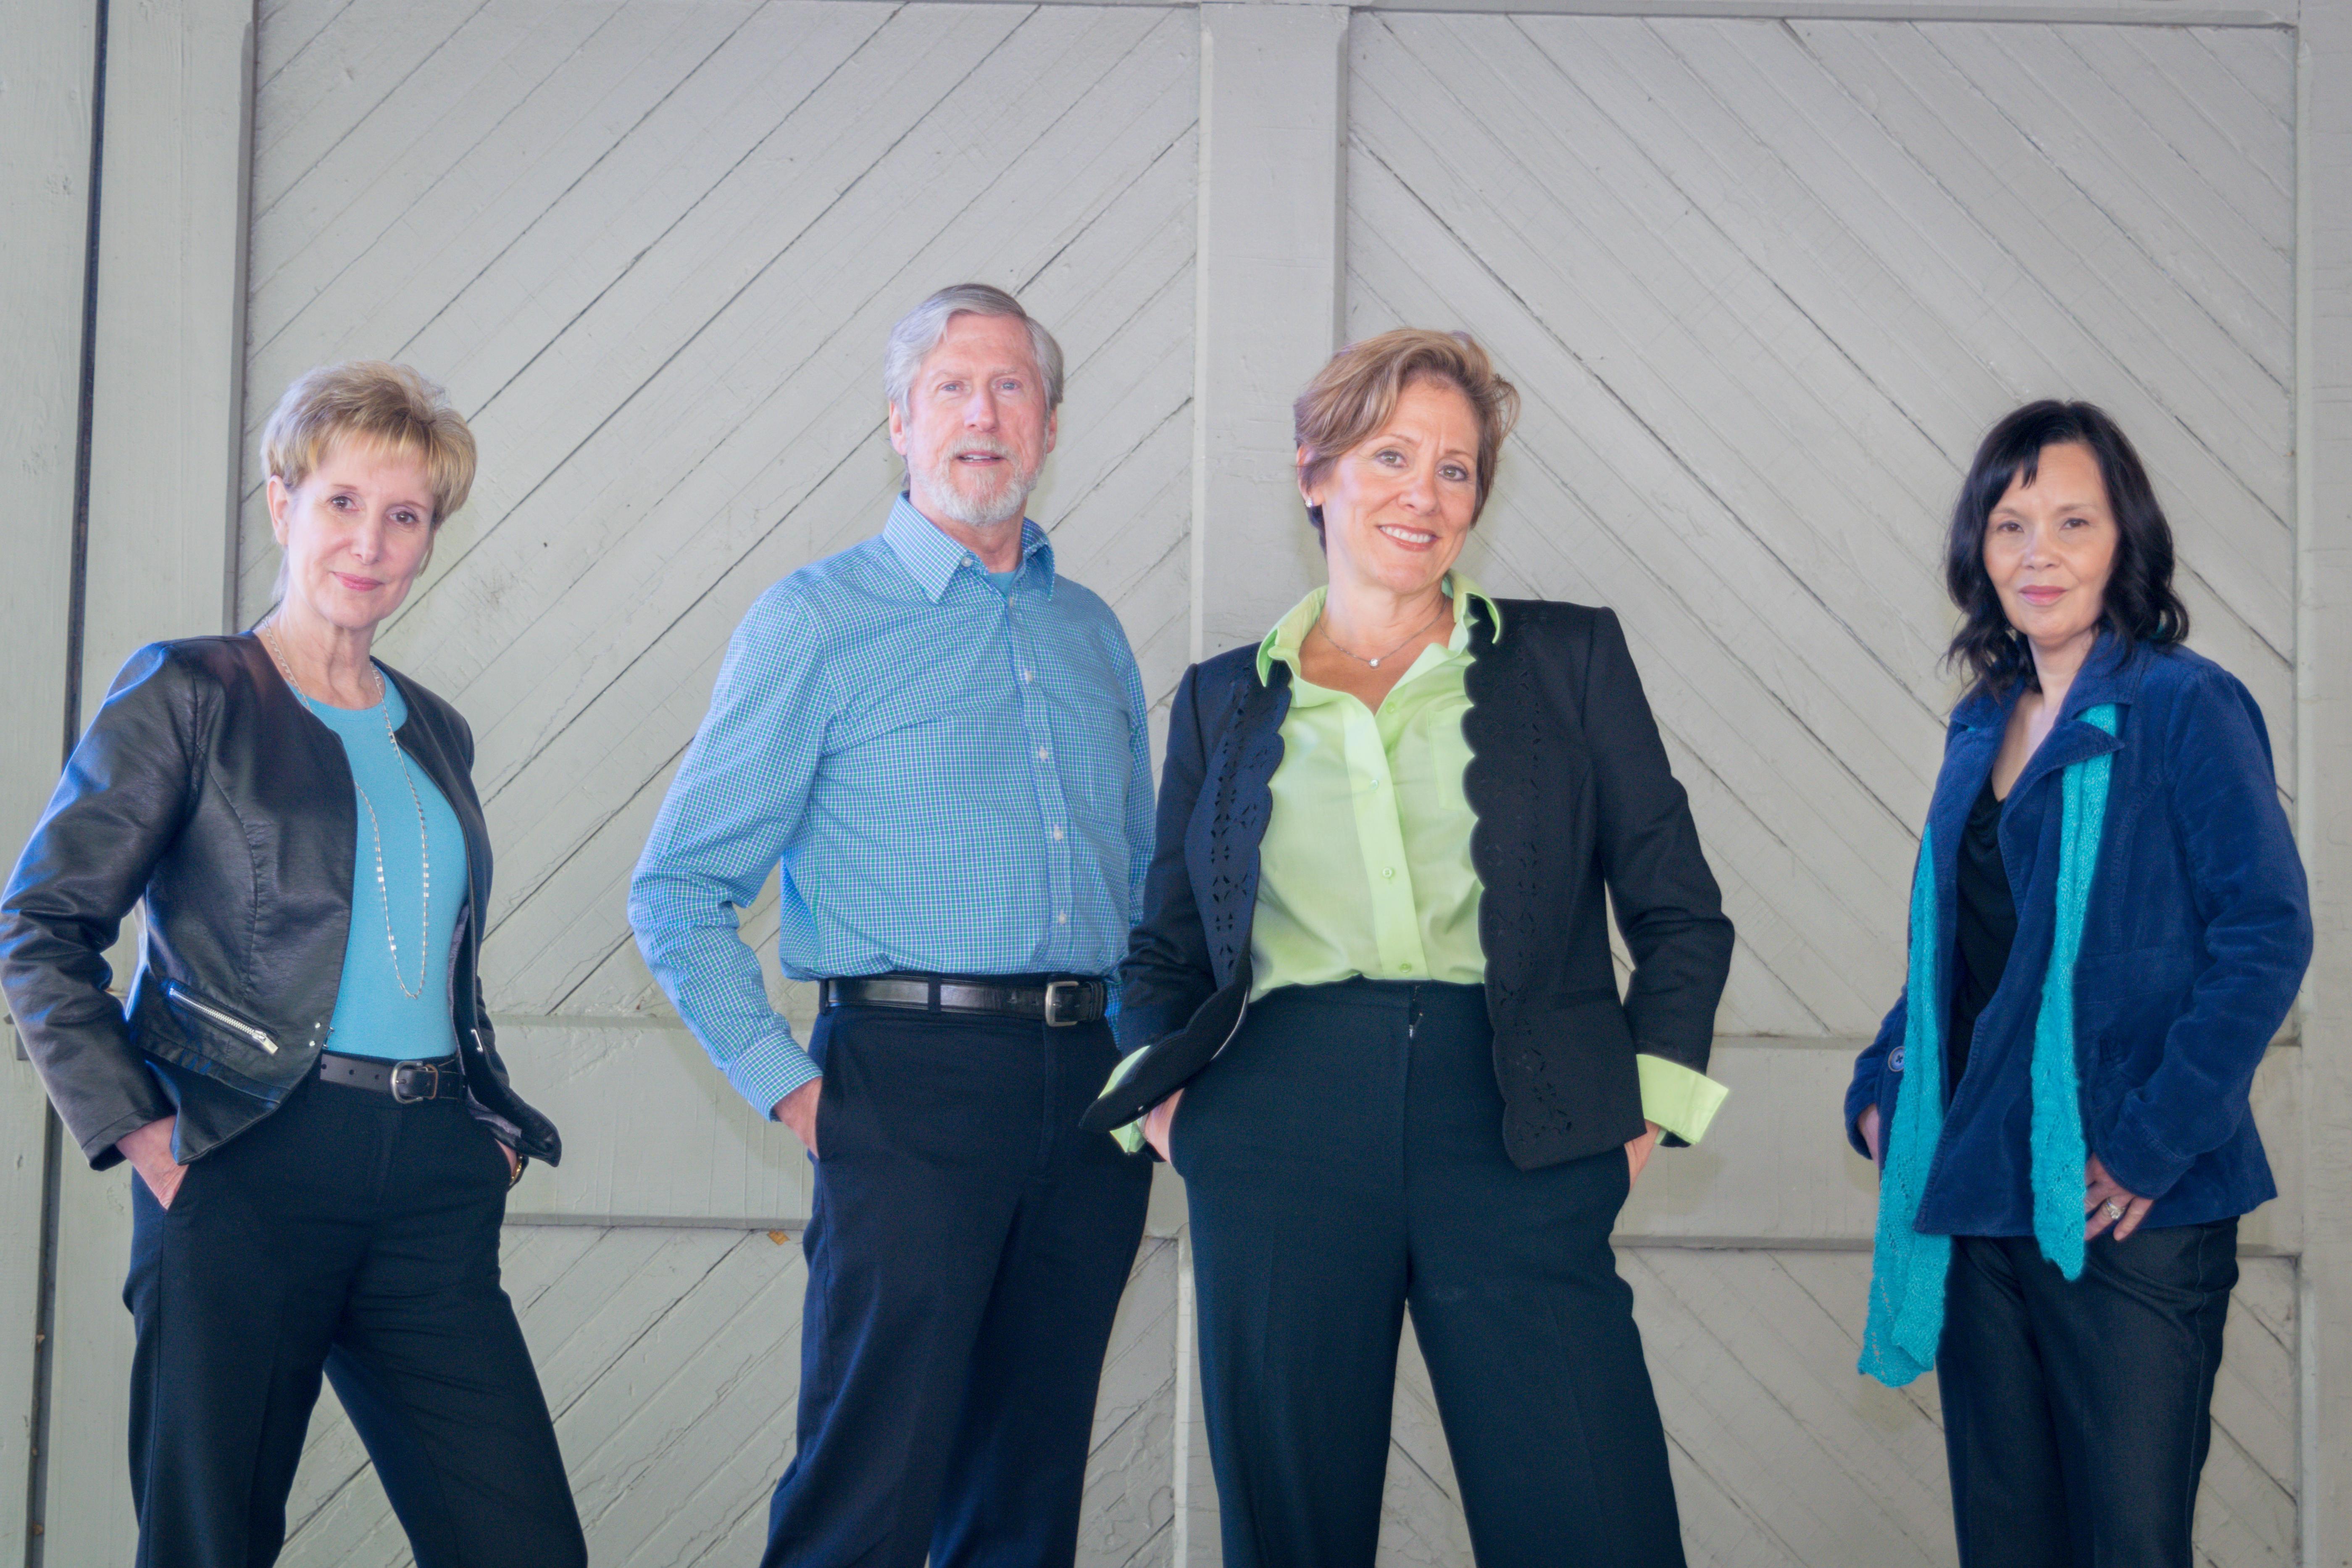 Leslie Eason Real Estate Team - Keller Williams image 1